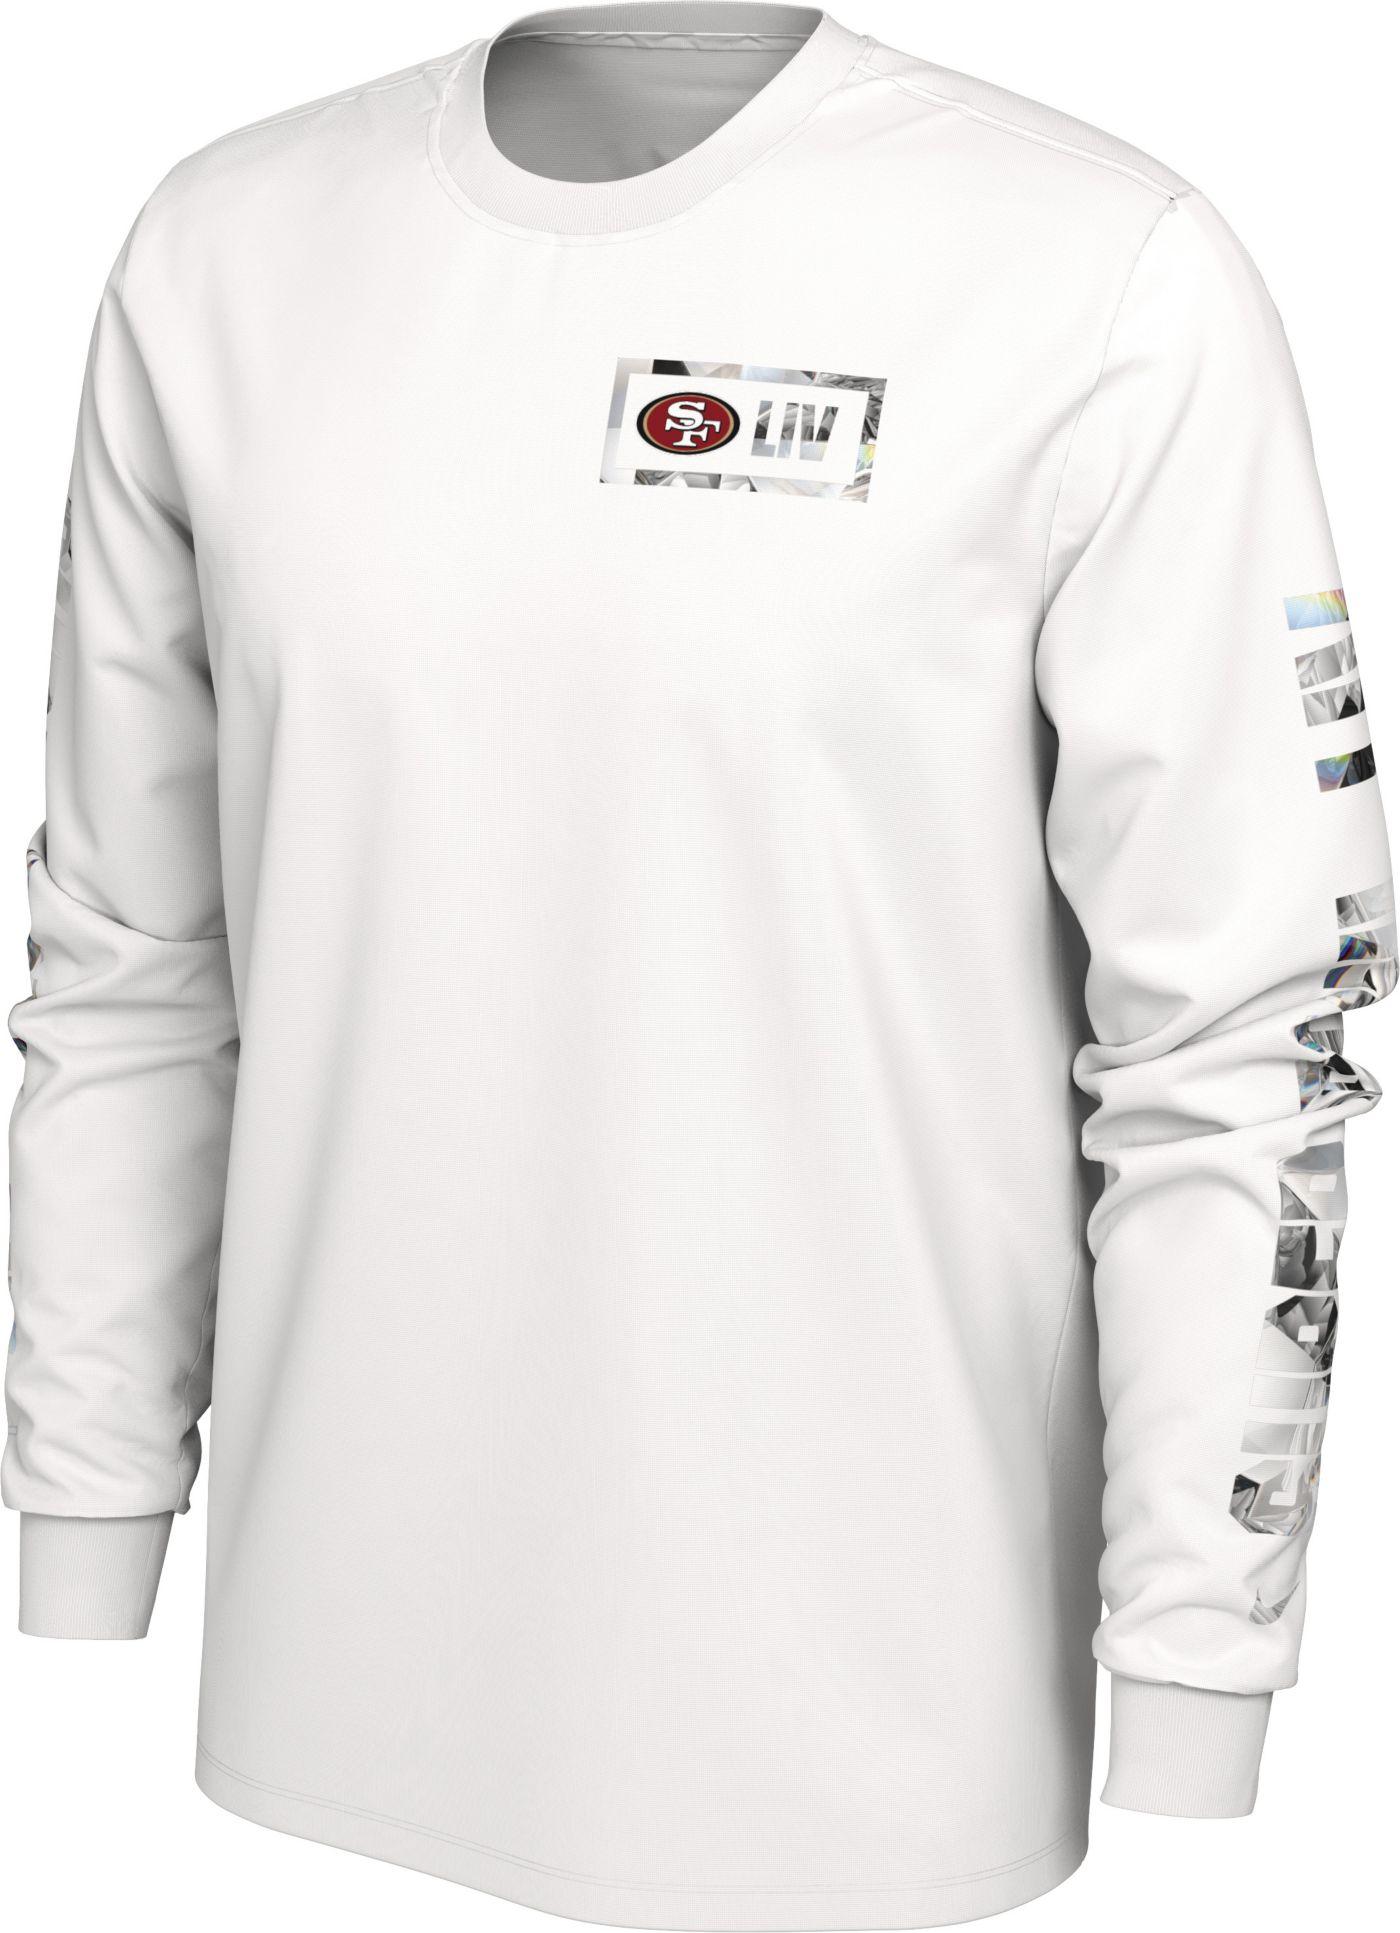 Nike Men's Super Bowl LIV San Francisco 49ers Media Long Sleeve Shirt